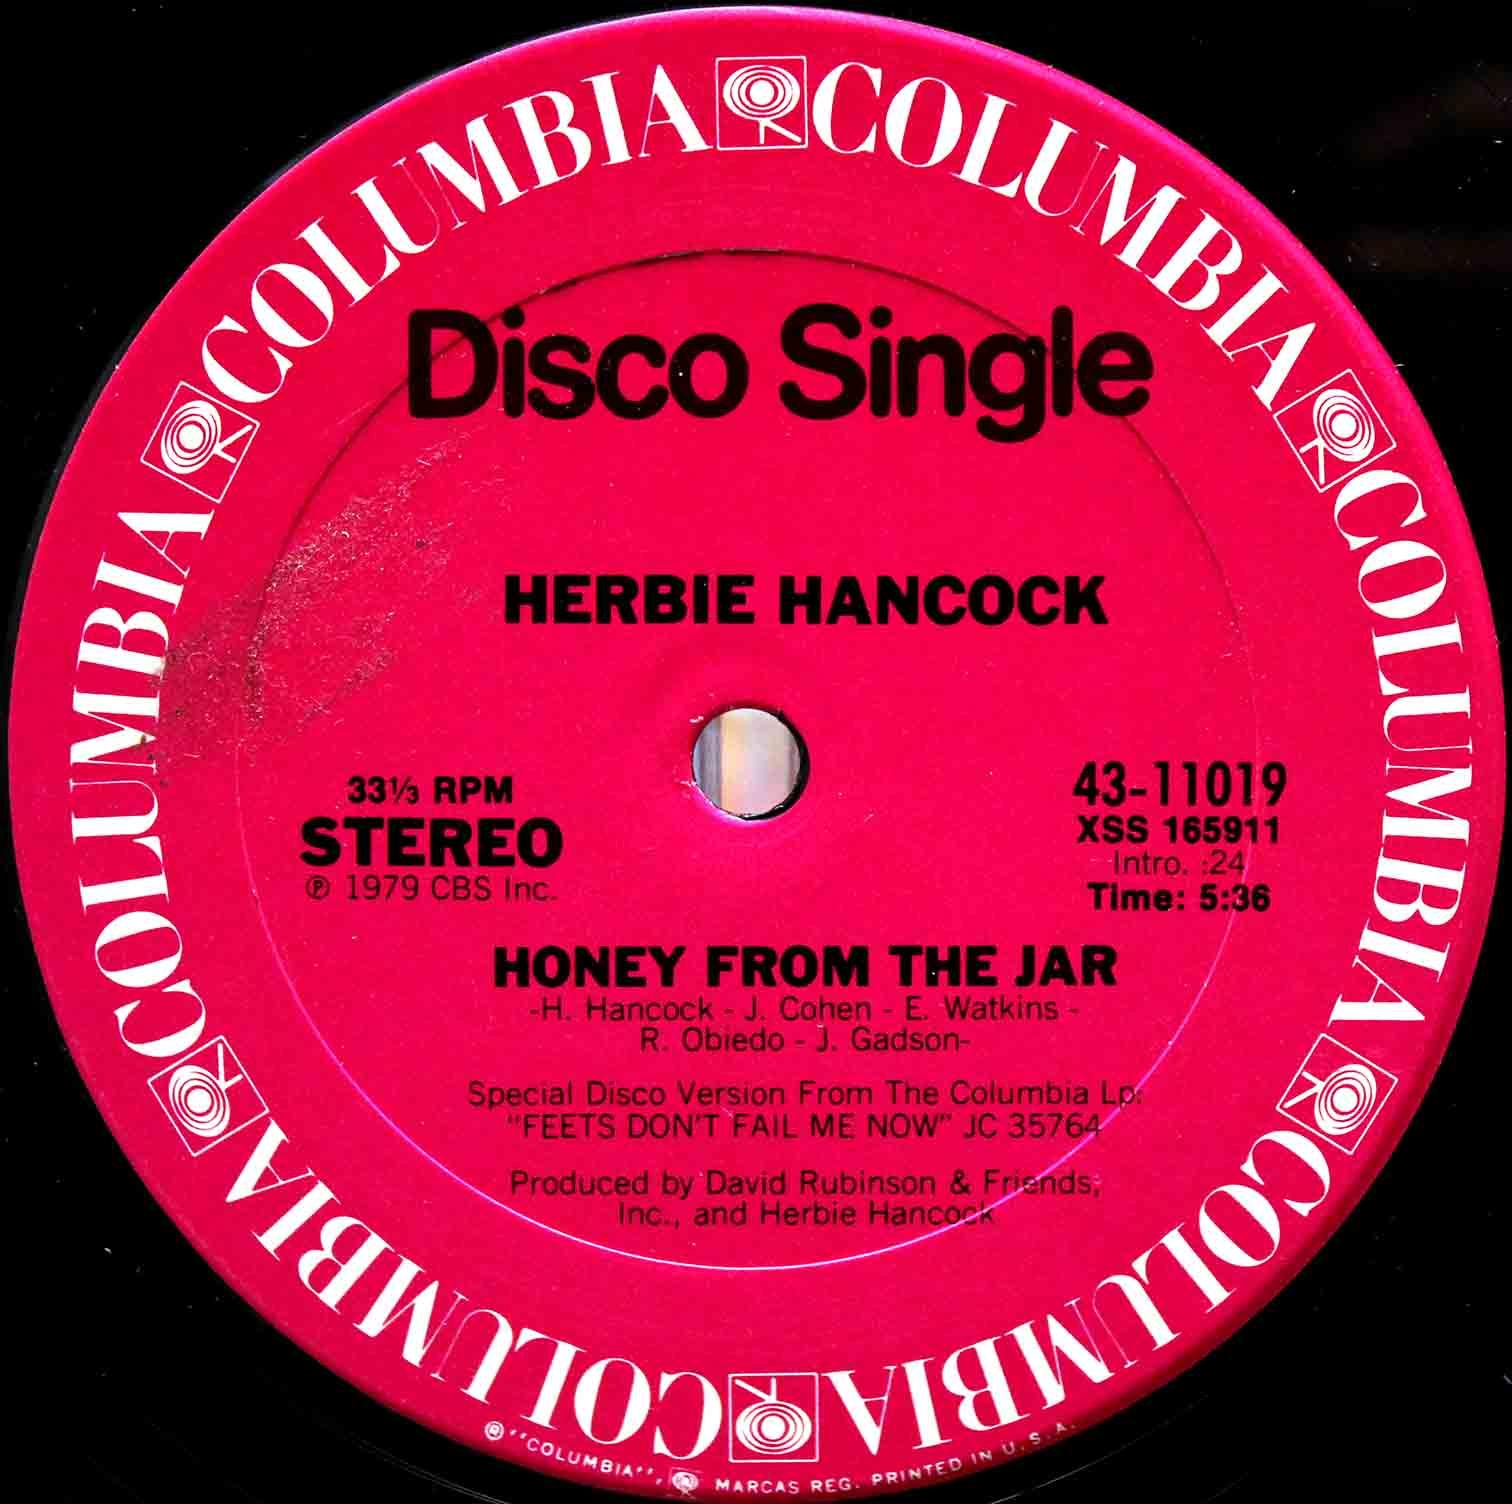 Herbie Hancock – Tell Everybody 04